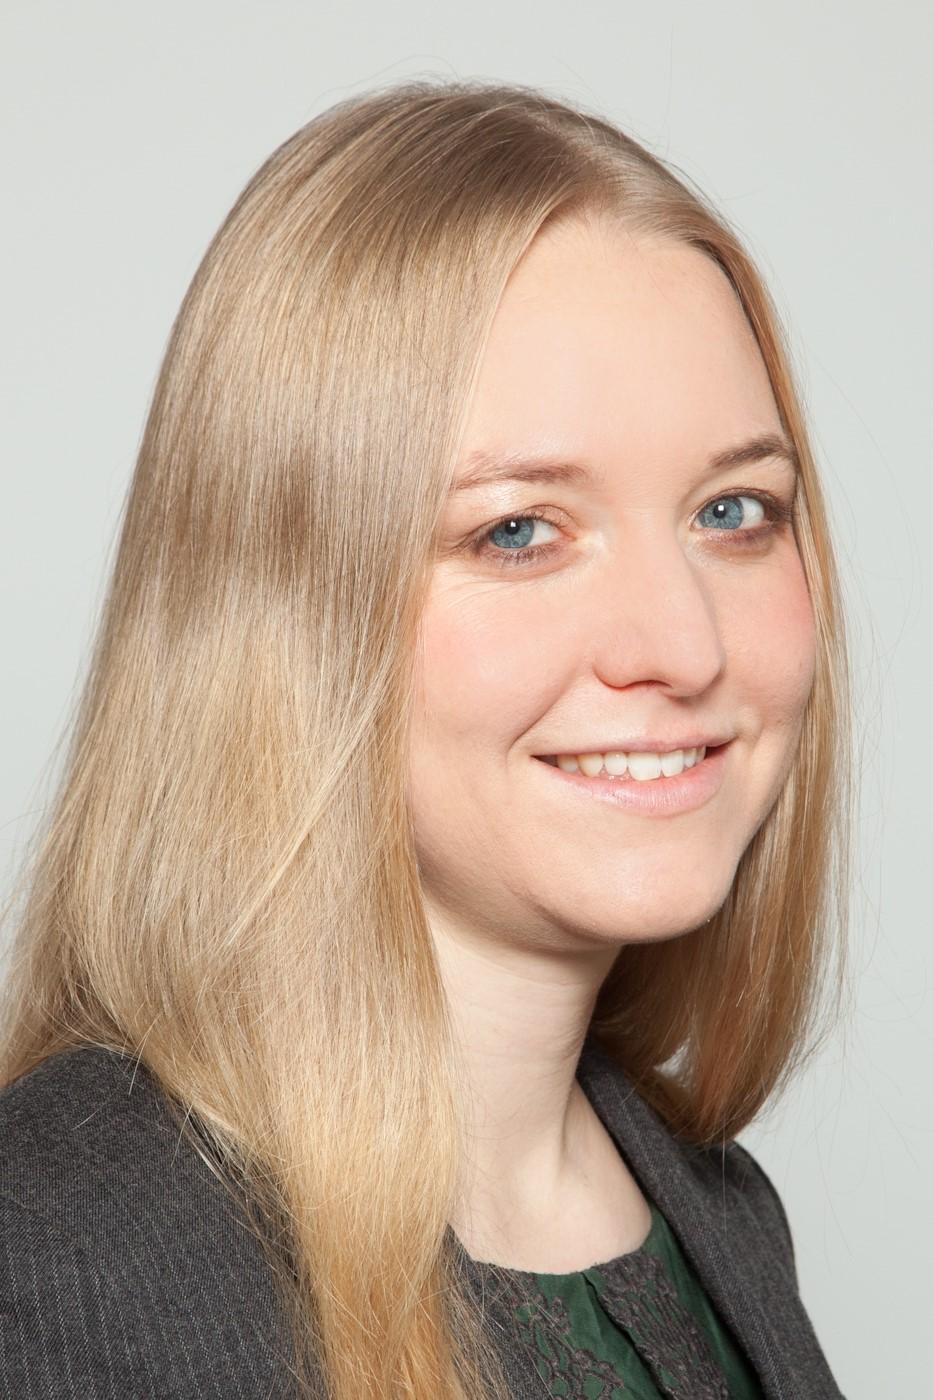 Karin Somerlik-Fuchs